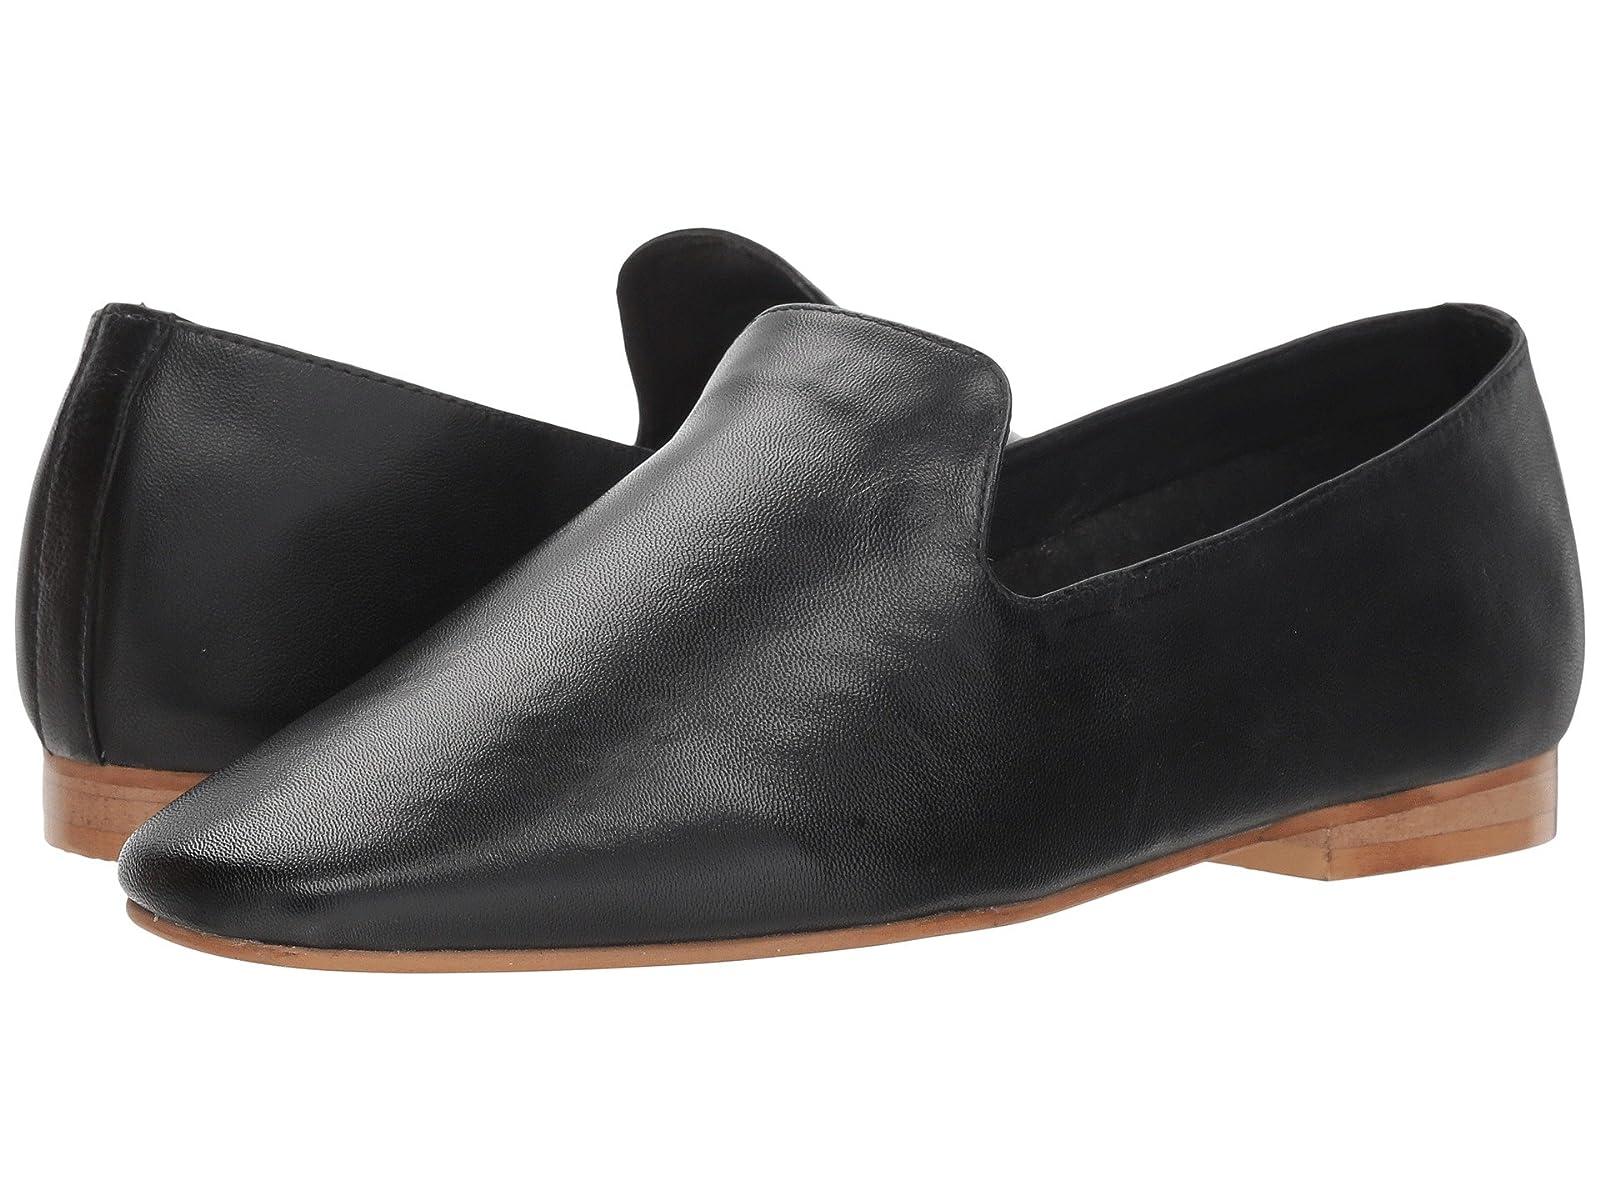 Chinese Laundry JojoAtmospheric grades have affordable shoes